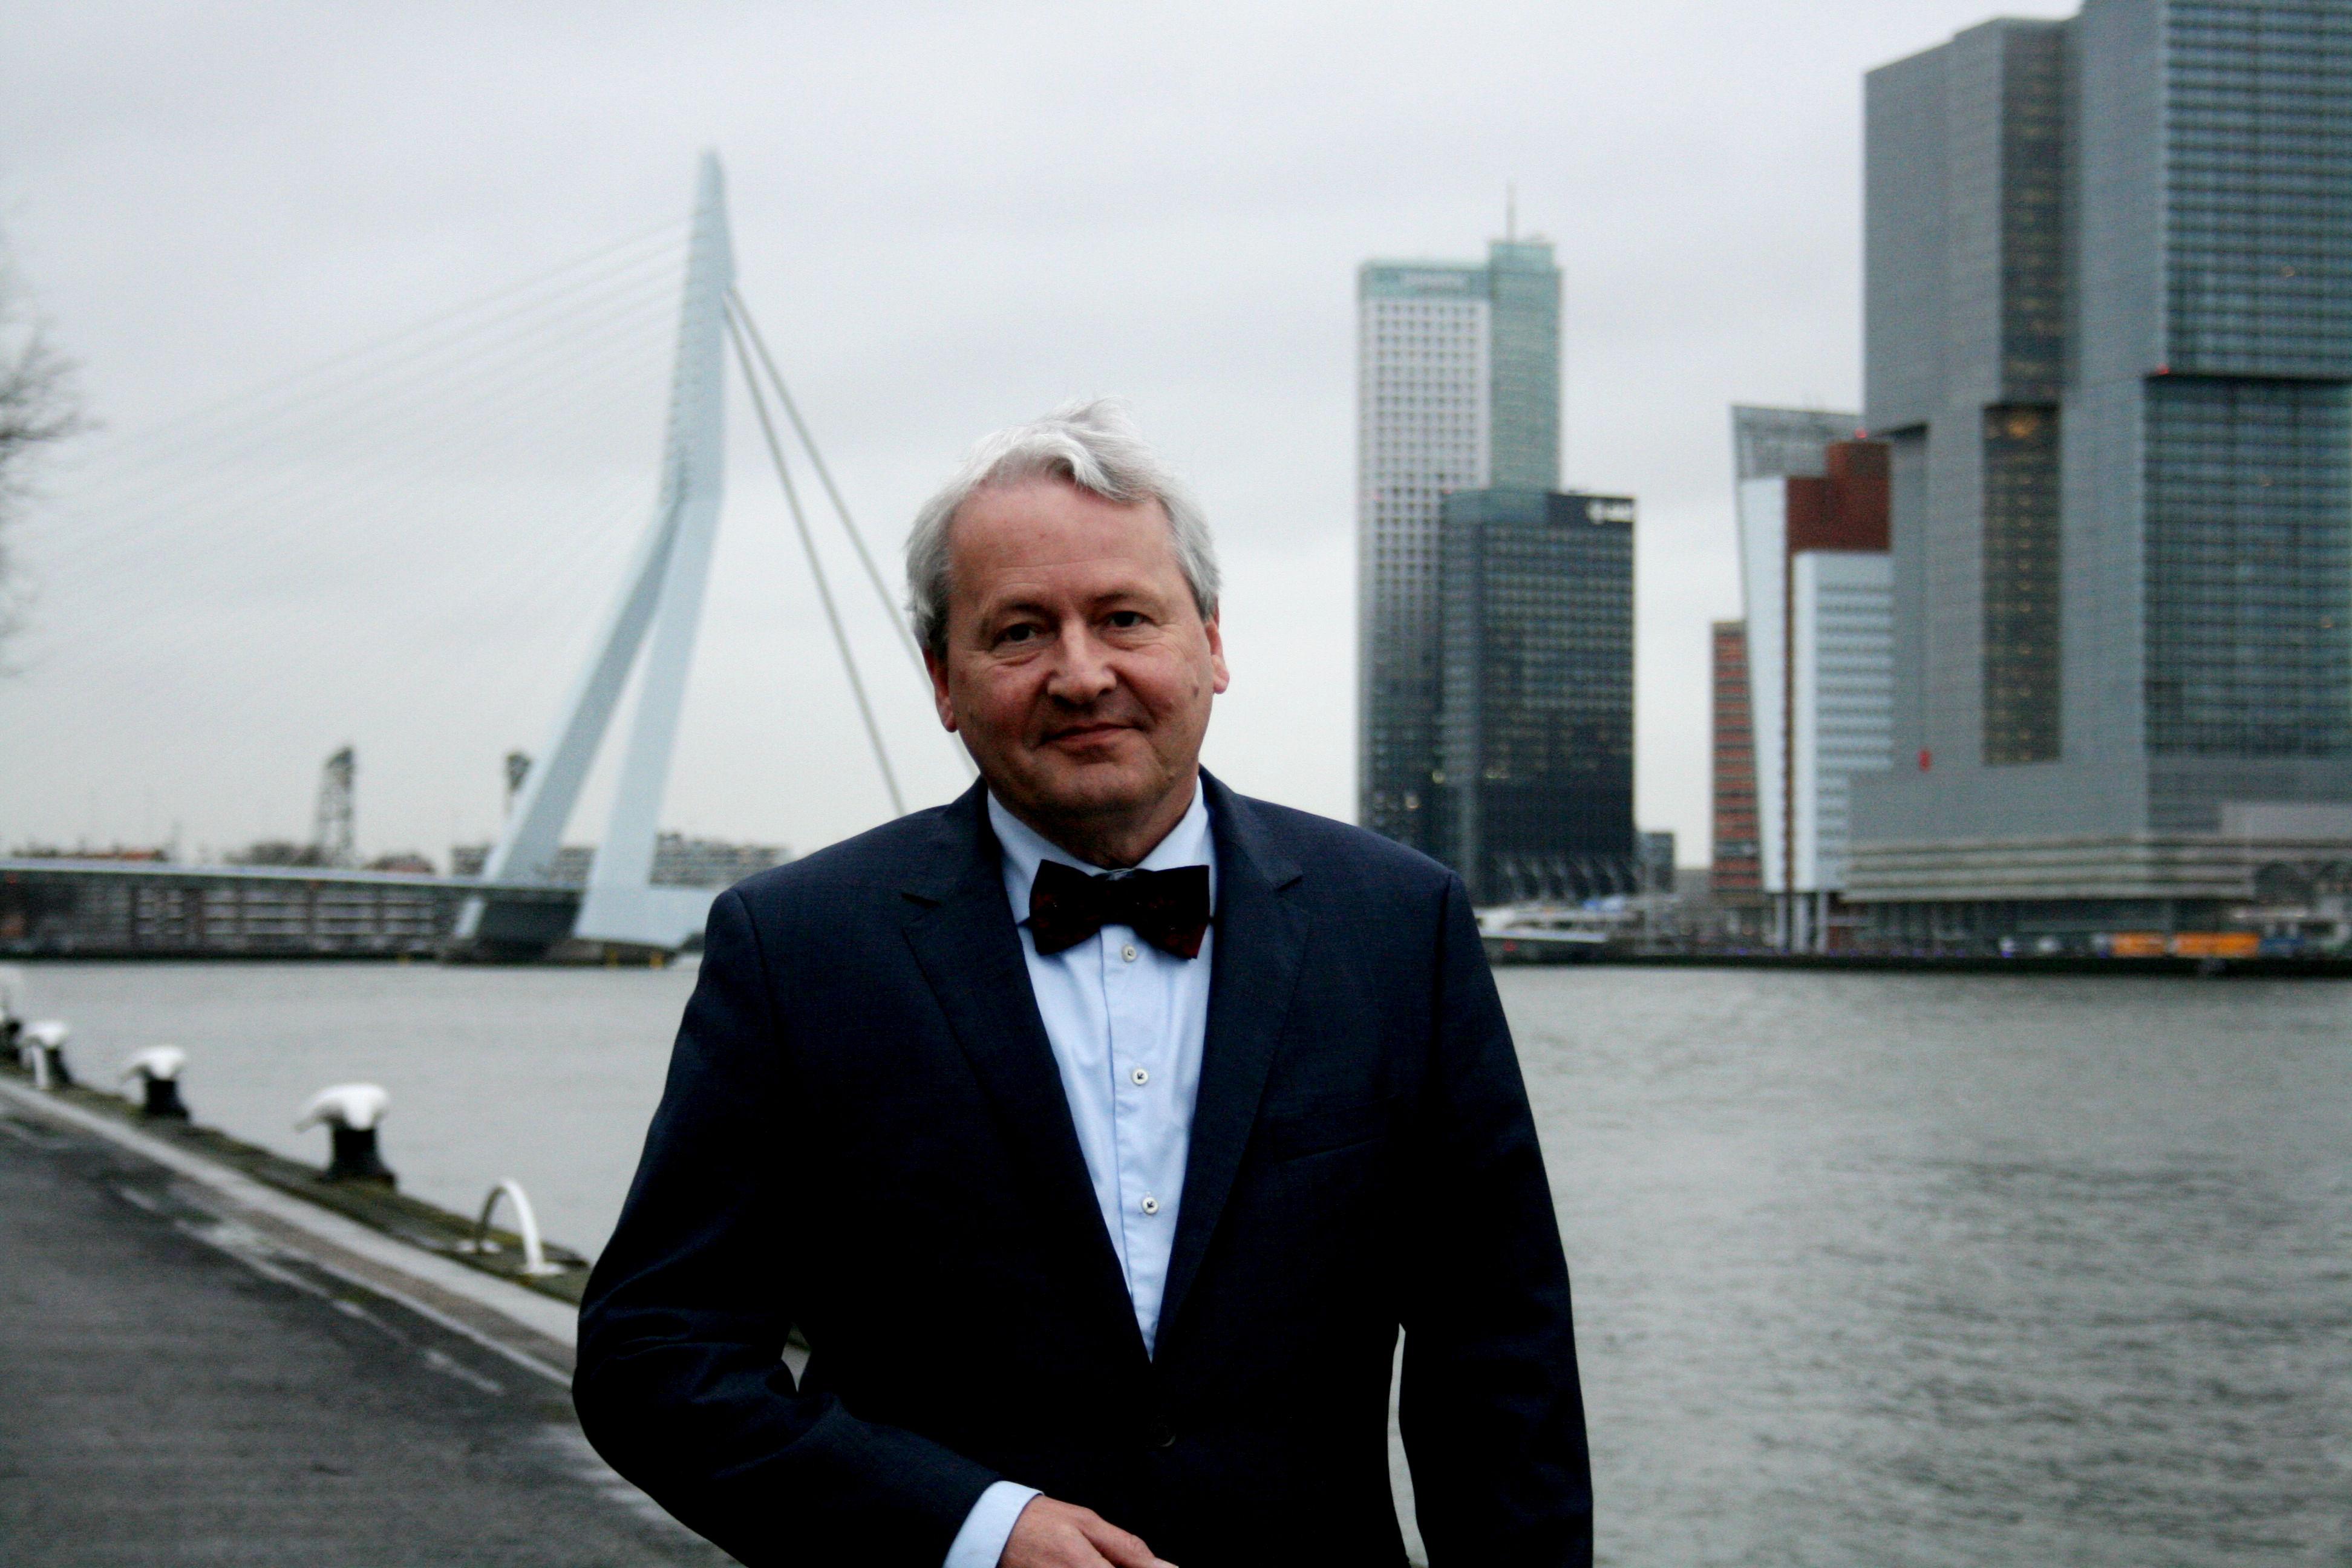 Wilfred Veldstra over leiderschap